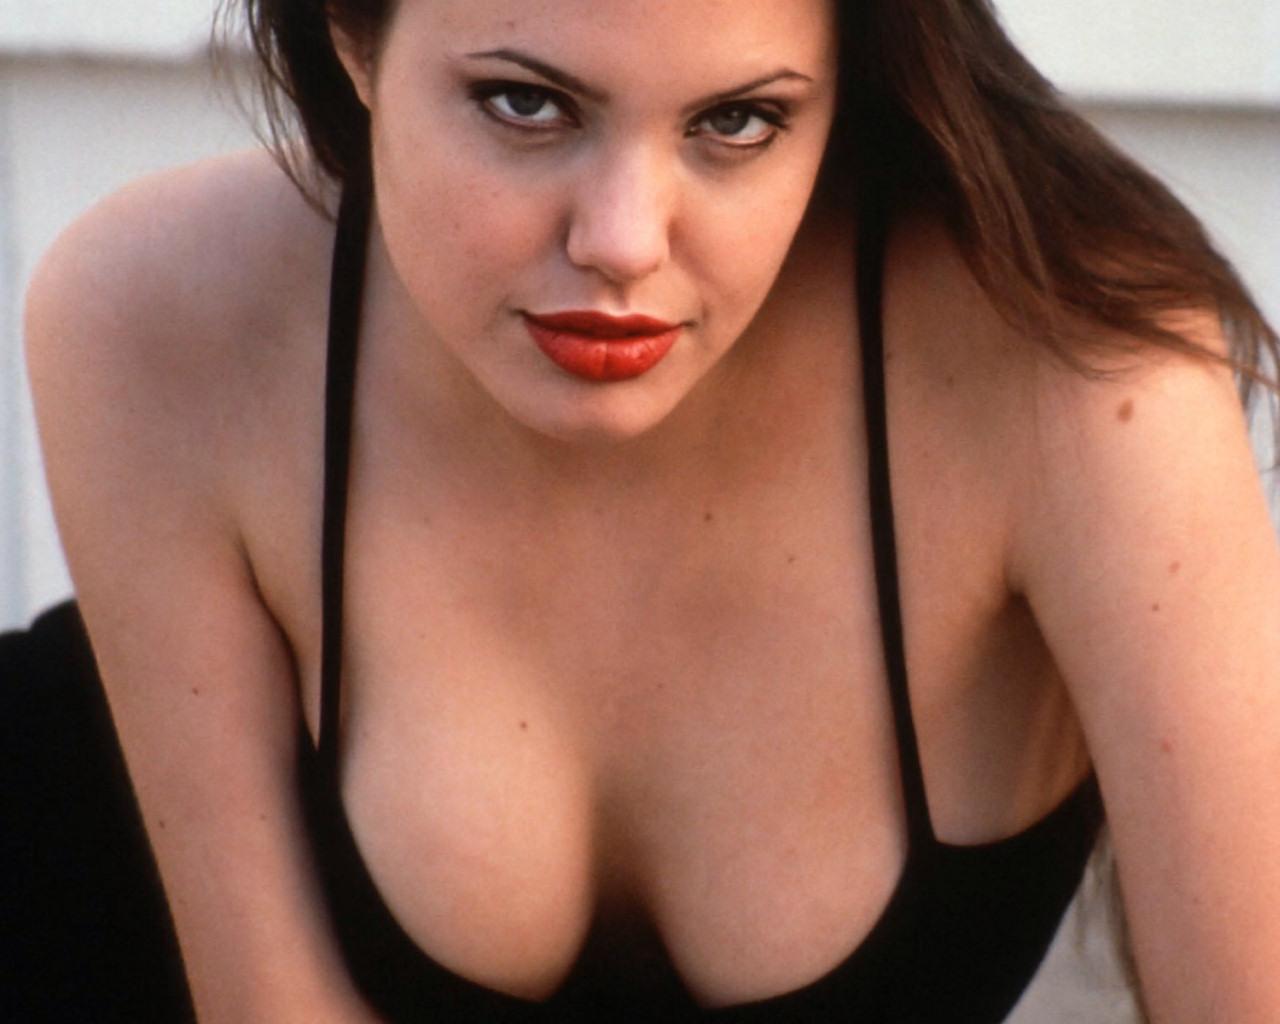 http://1.bp.blogspot.com/-qEbQDcPQSos/Tv_2_4YAk-I/AAAAAAAAGMw/IJ_QPvzR4M4/s1600/angelina+jolie-hot-images-2012.jpg